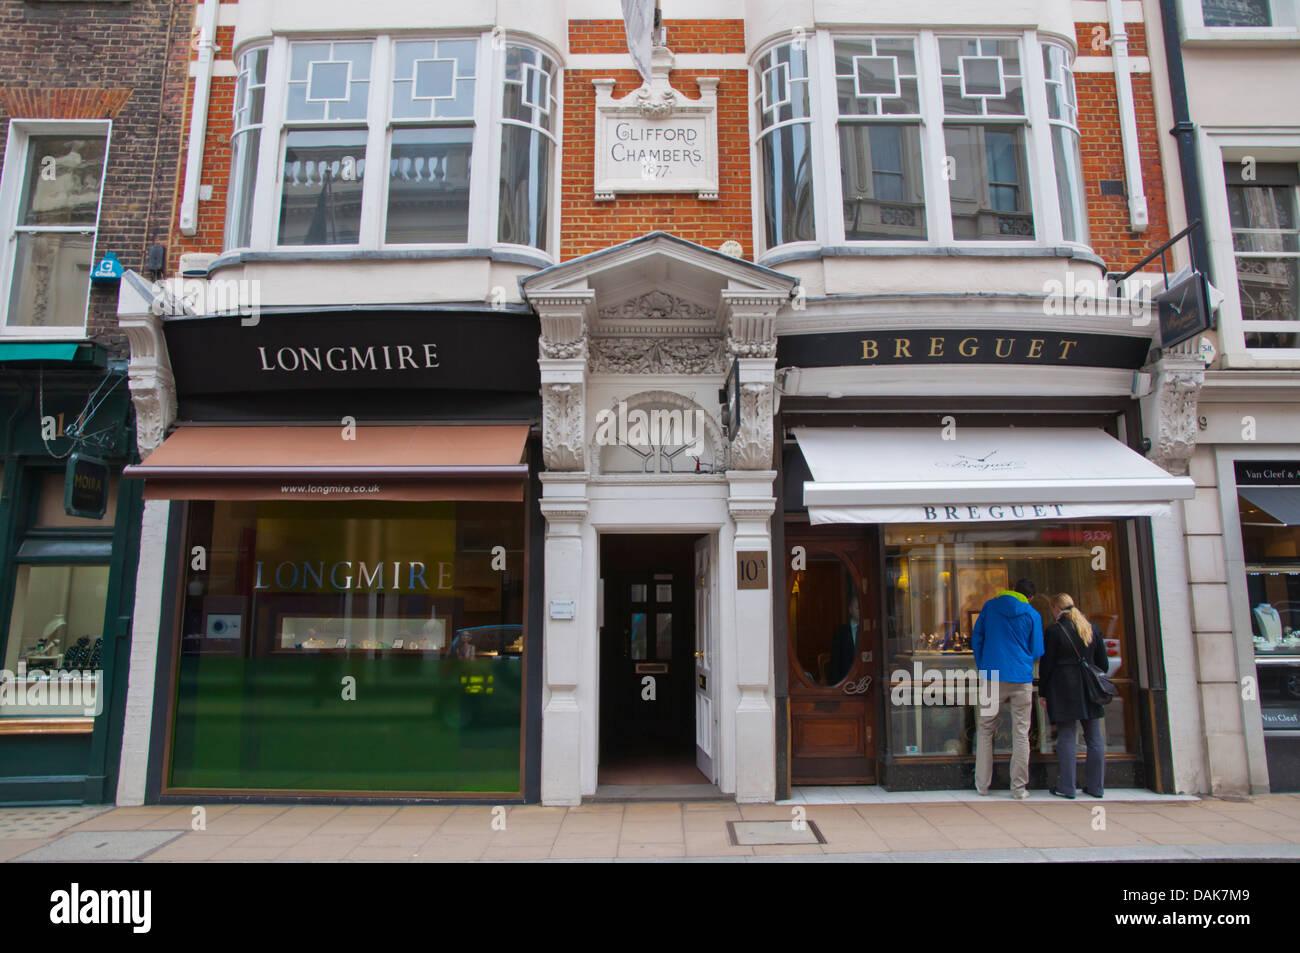 Jewellery shop Old Bond street Mayfair central London England Britain UK Europe - Stock Image